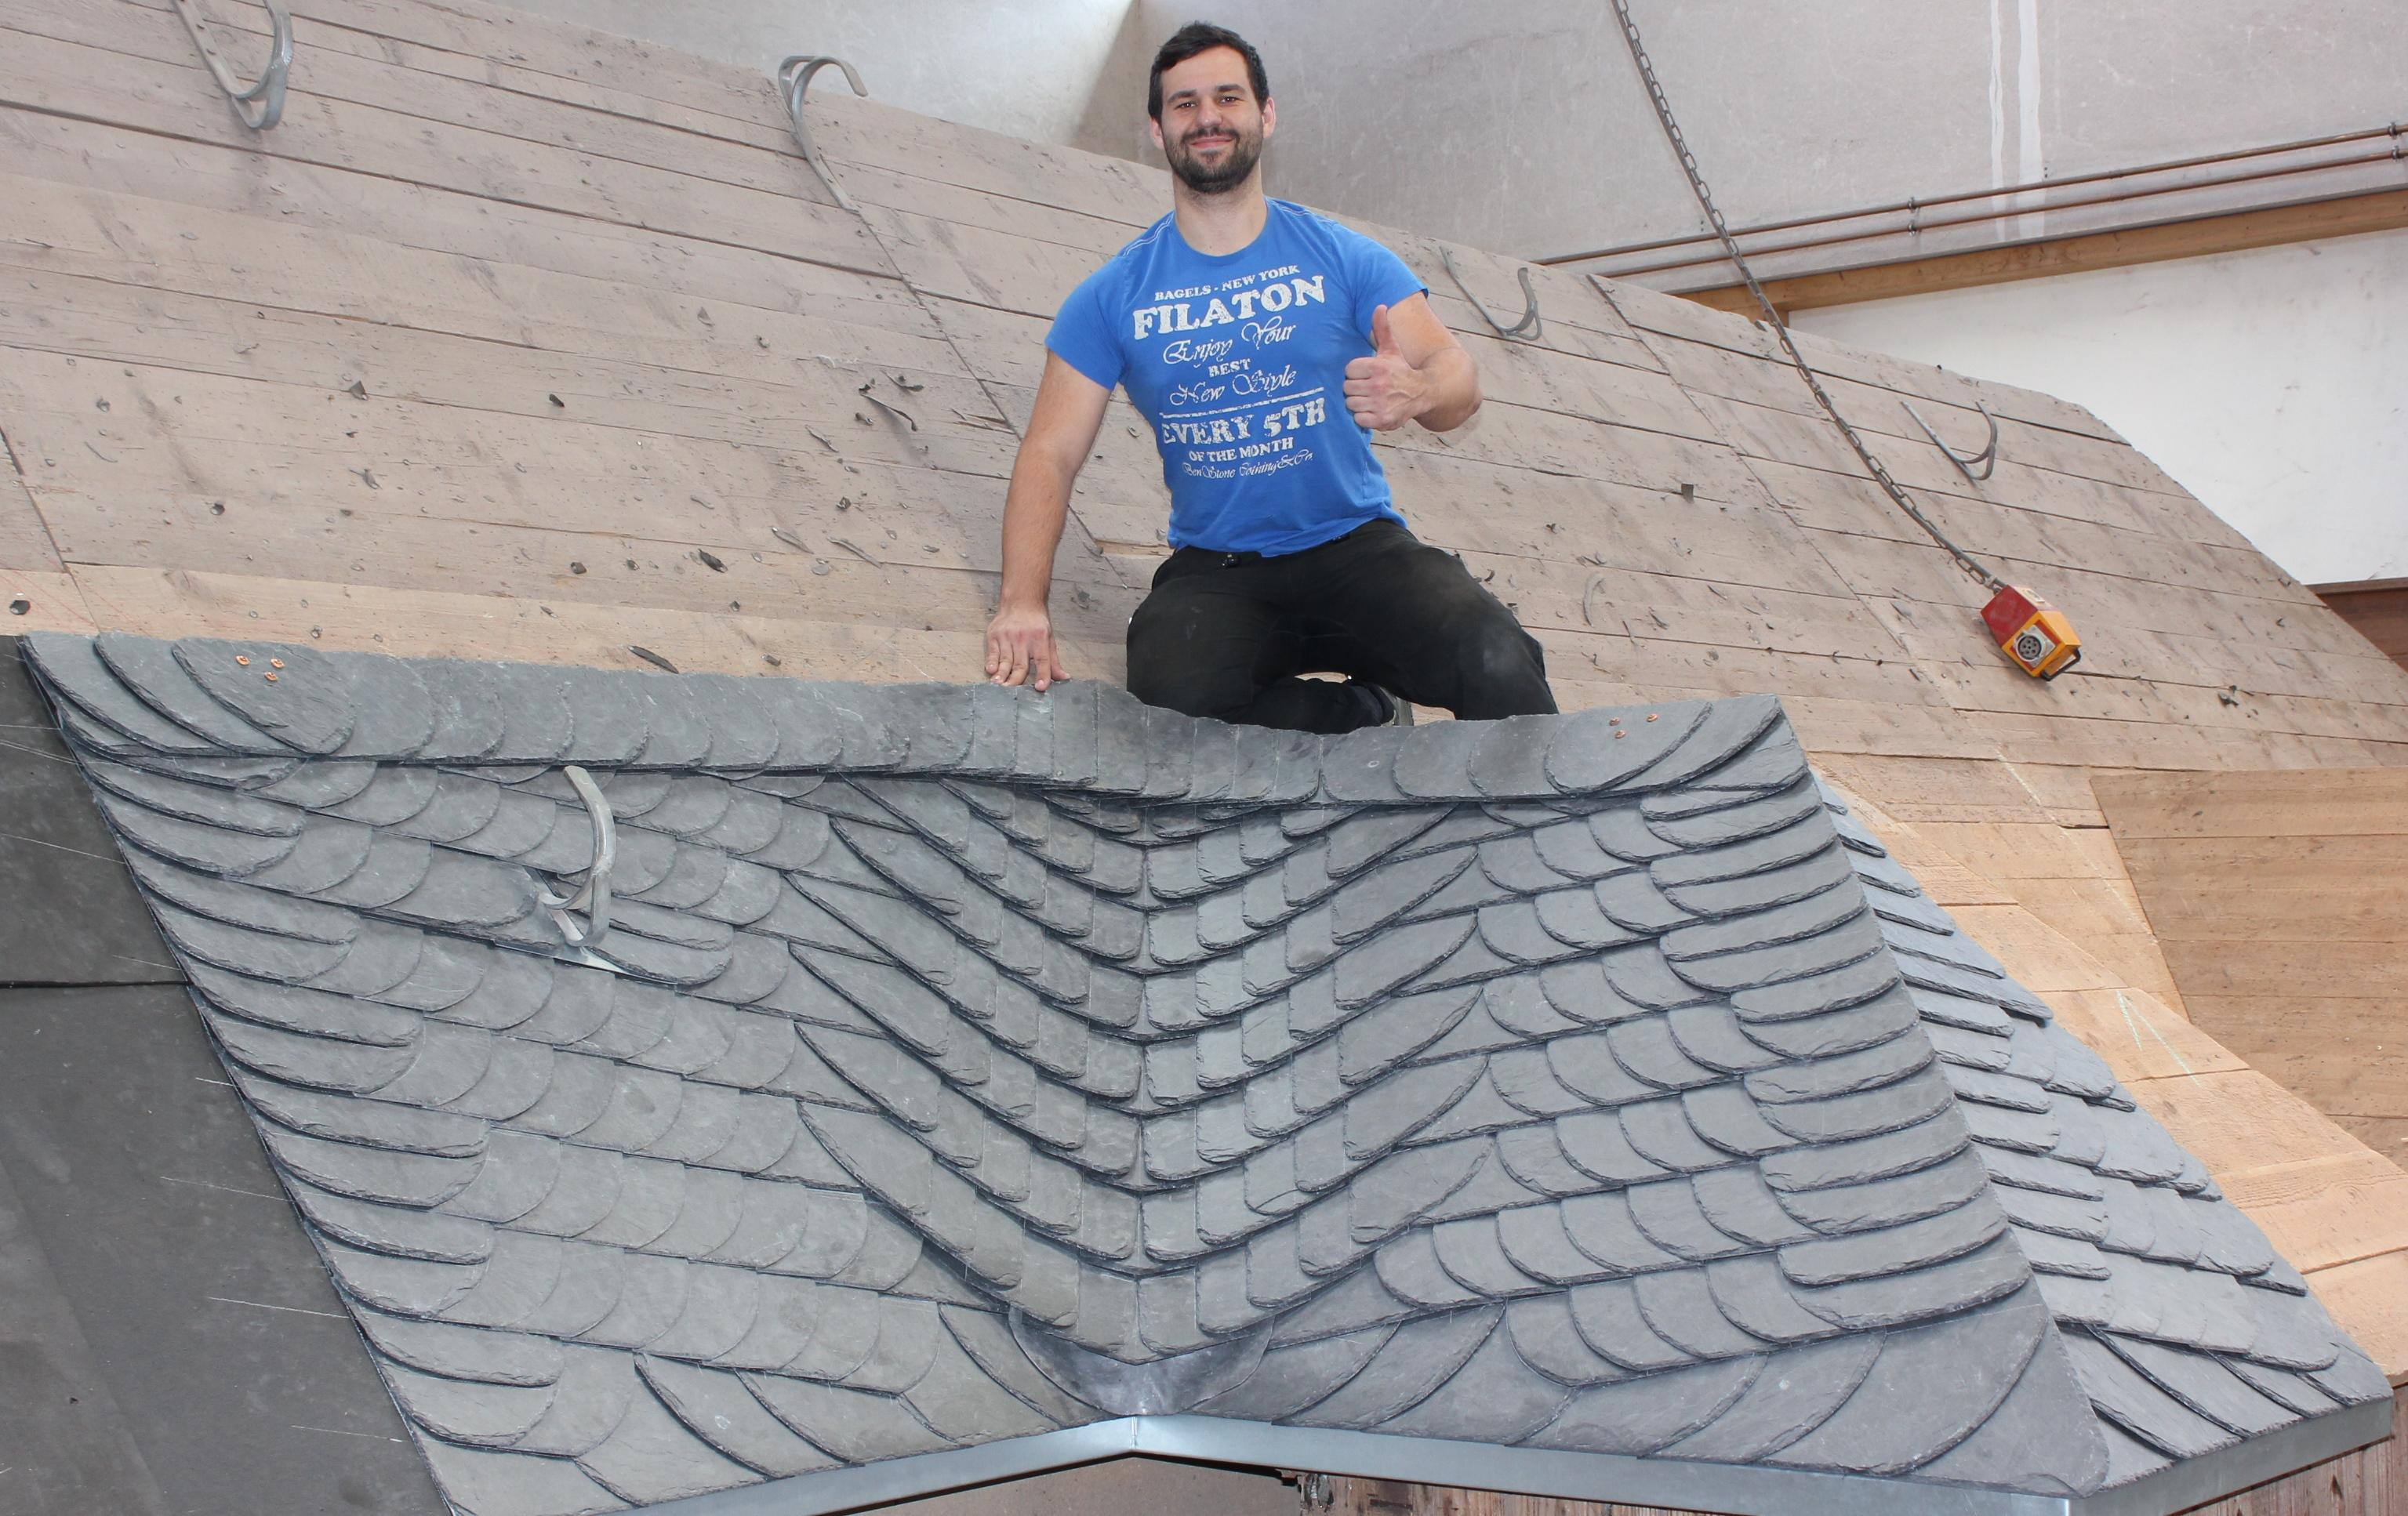 Dachdecker Kanada dachdeckermeister stehen über den dingen muw nachrichten de